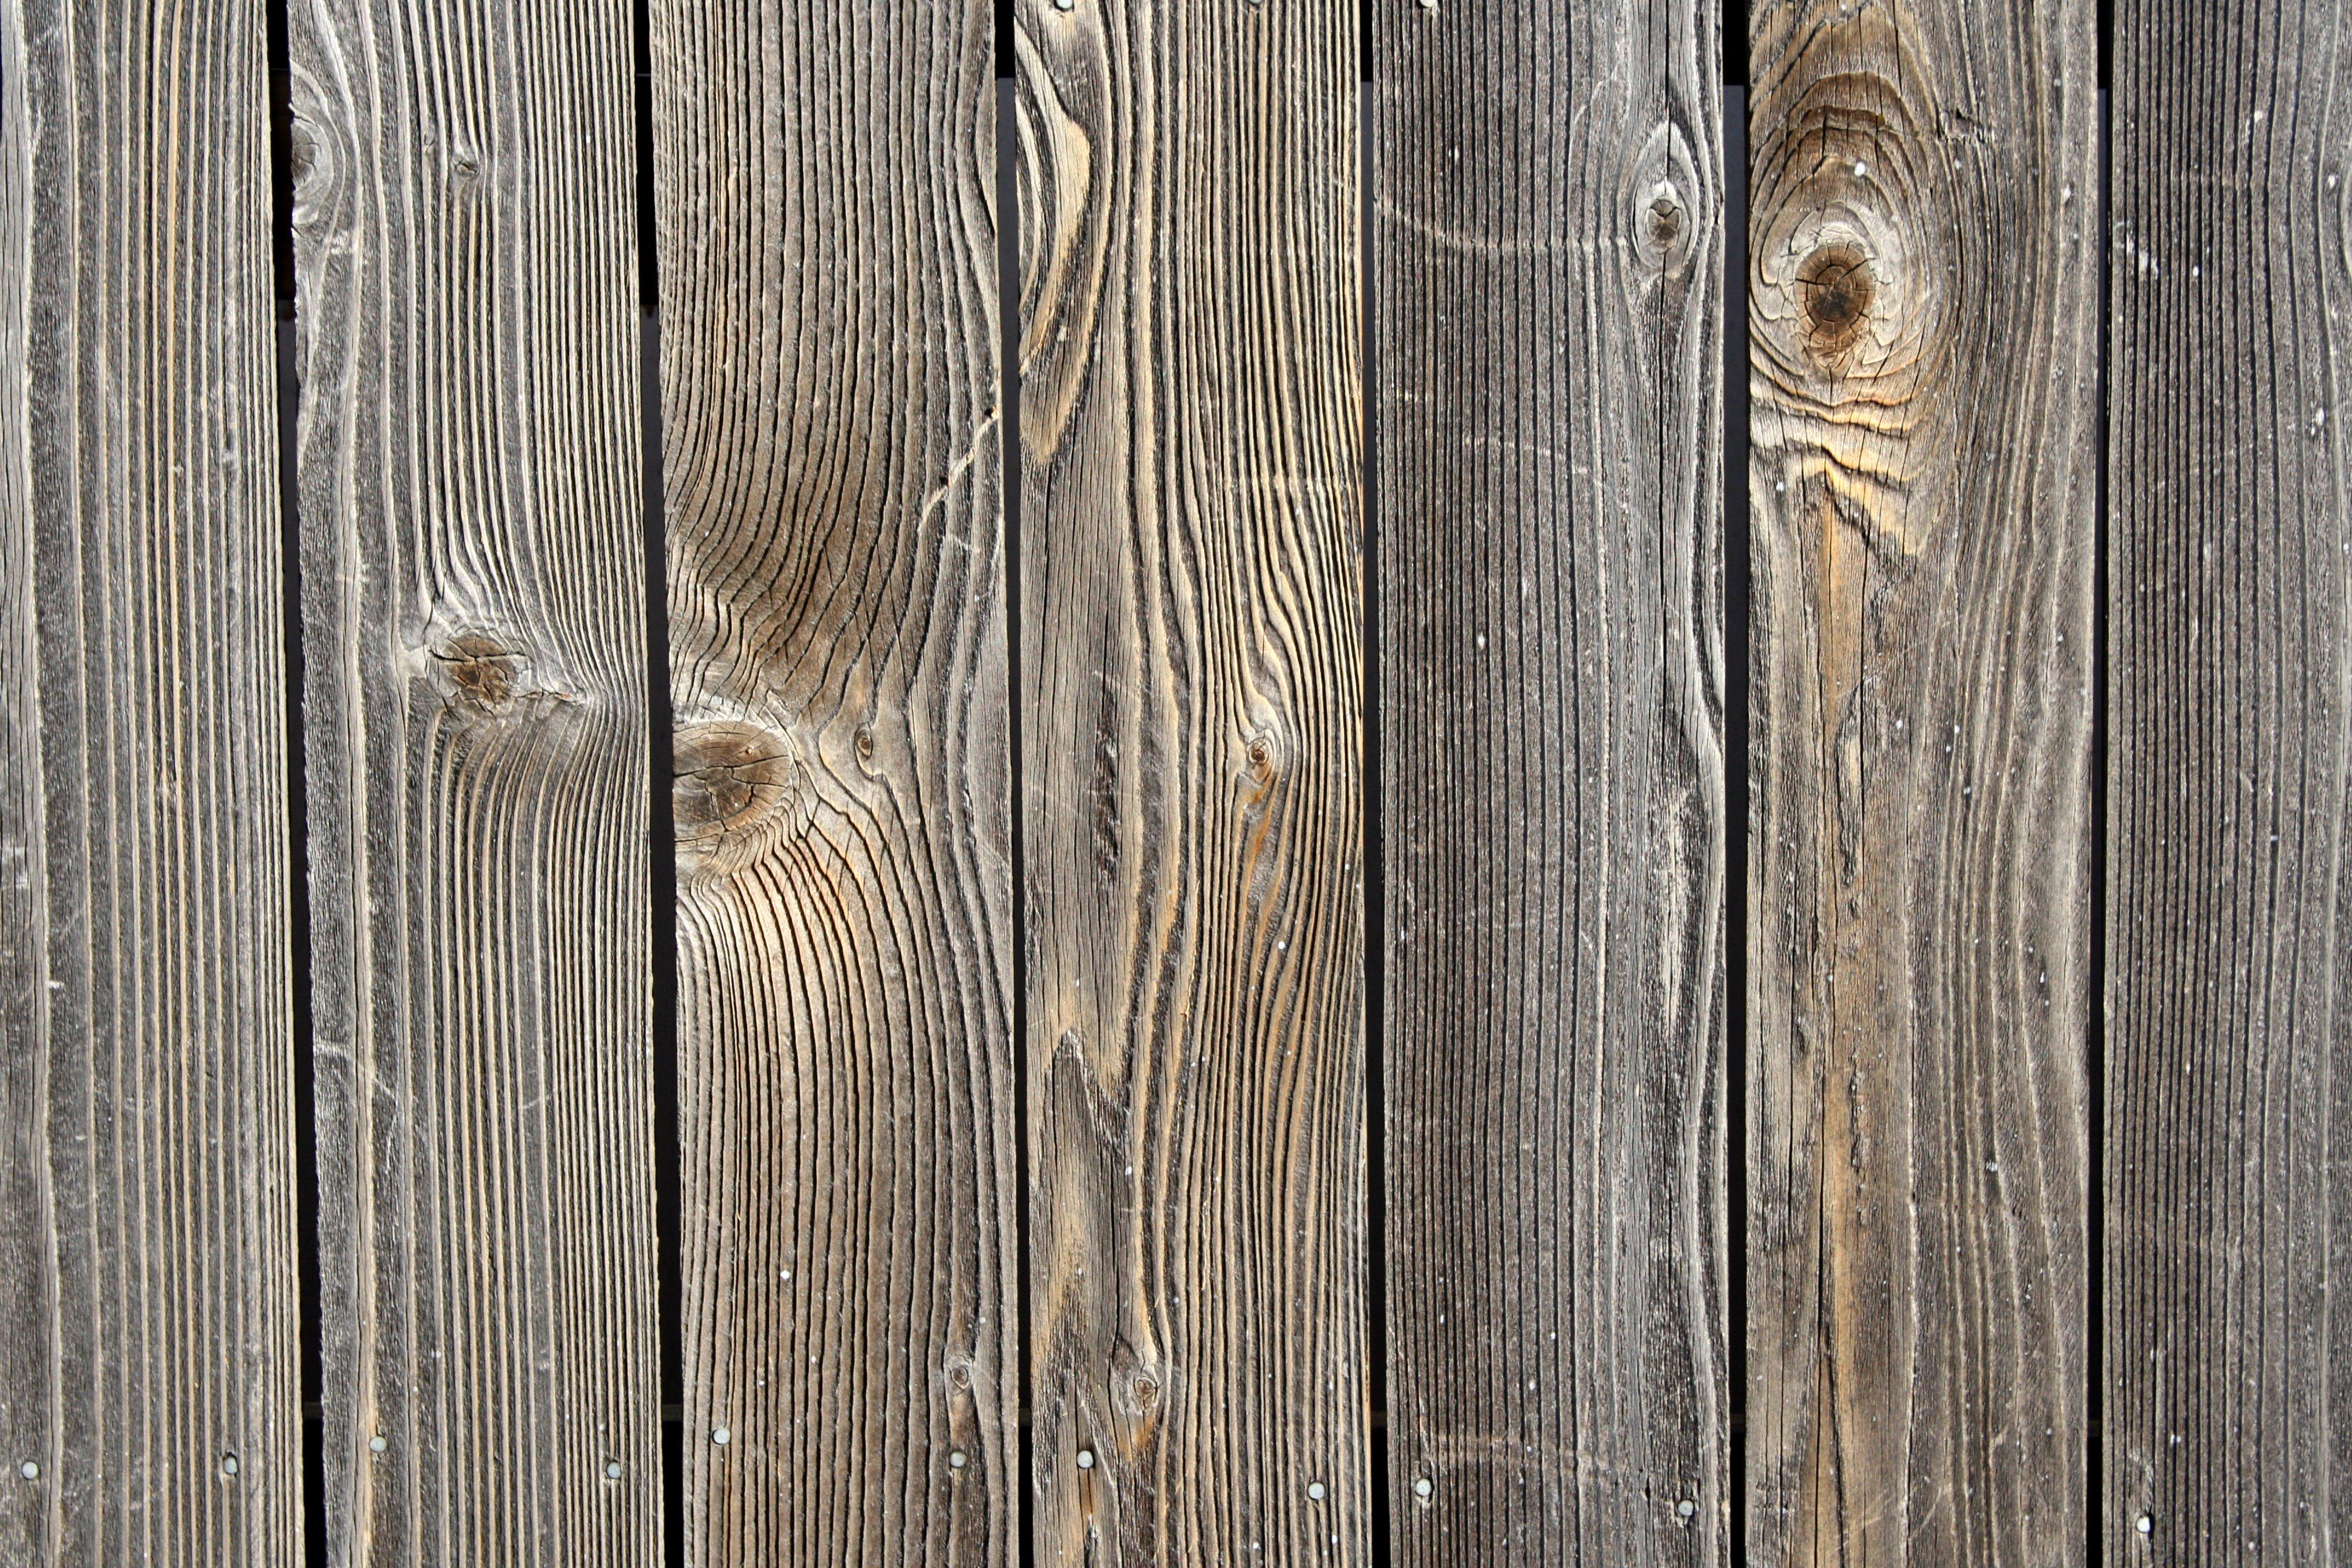 barn wood background - photo #20